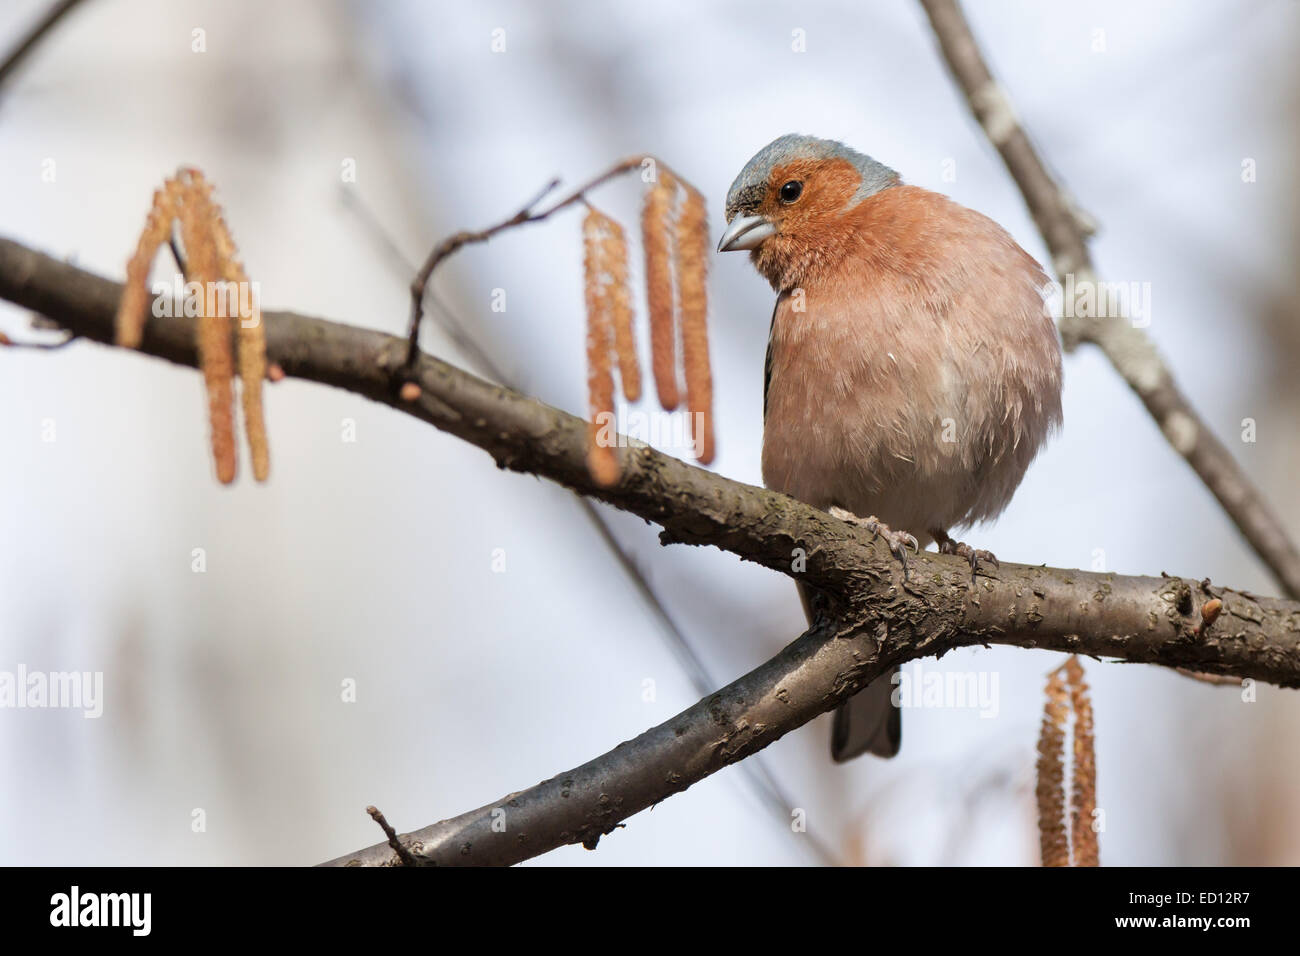 Chaffinch (Fringilla coelebs).Wild bird in a natural habitat. - Stock Image